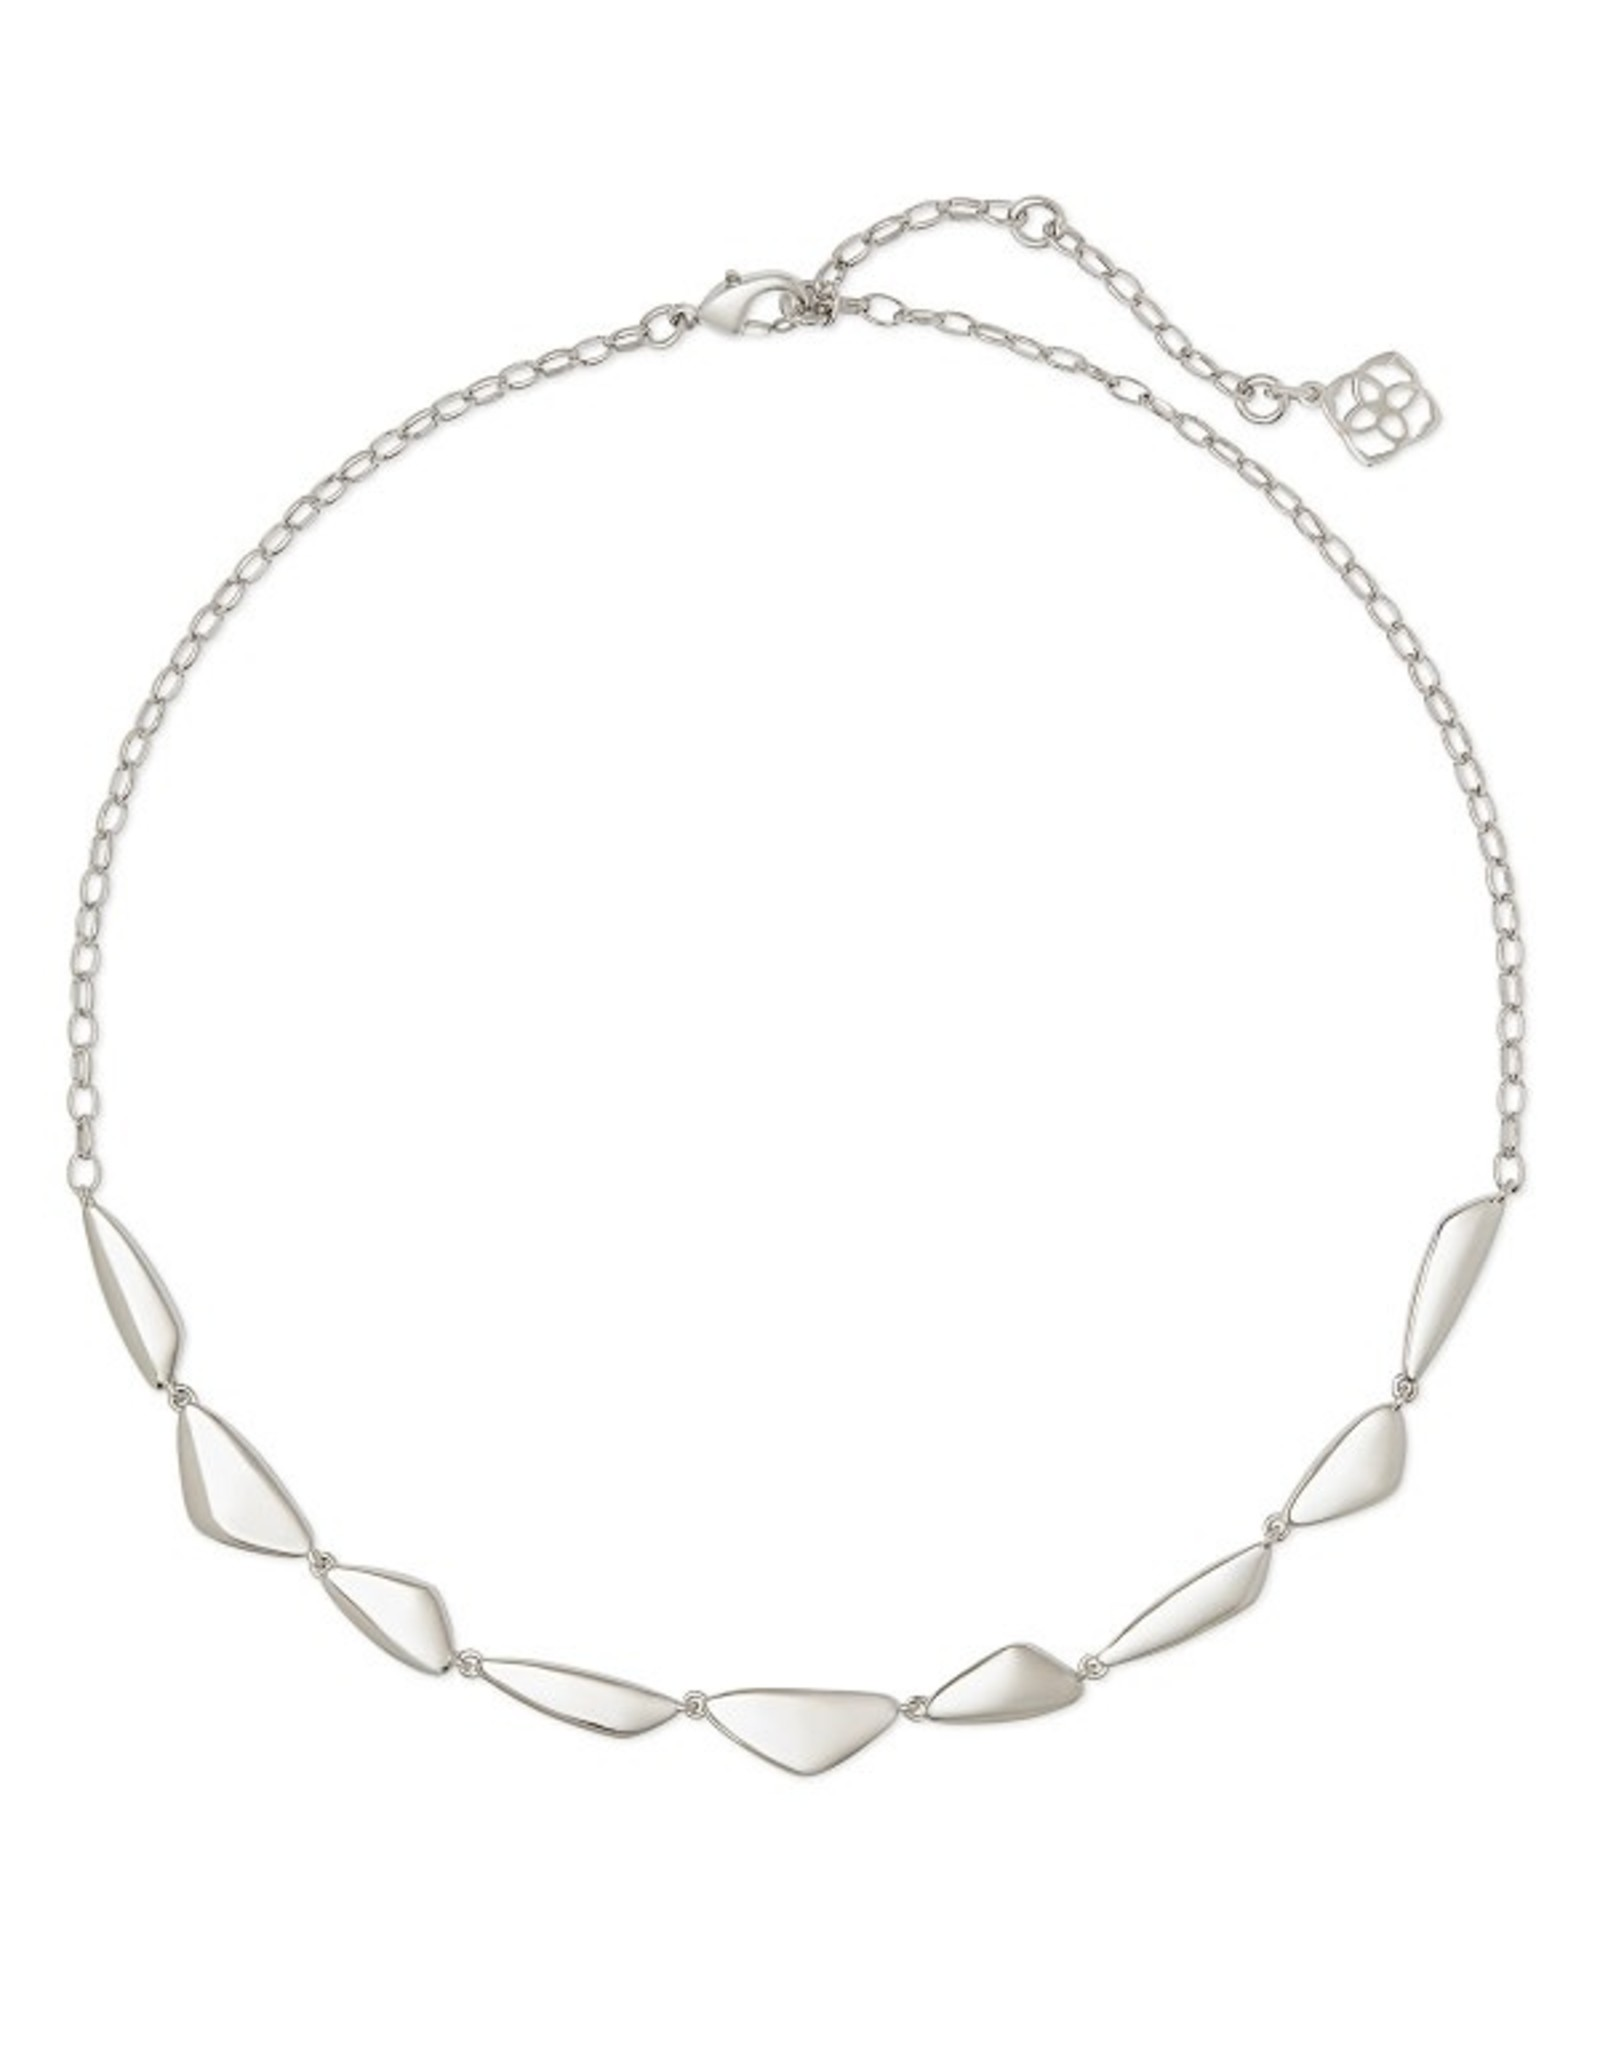 Kendra Scott Kira Short Strand Necklace Silver